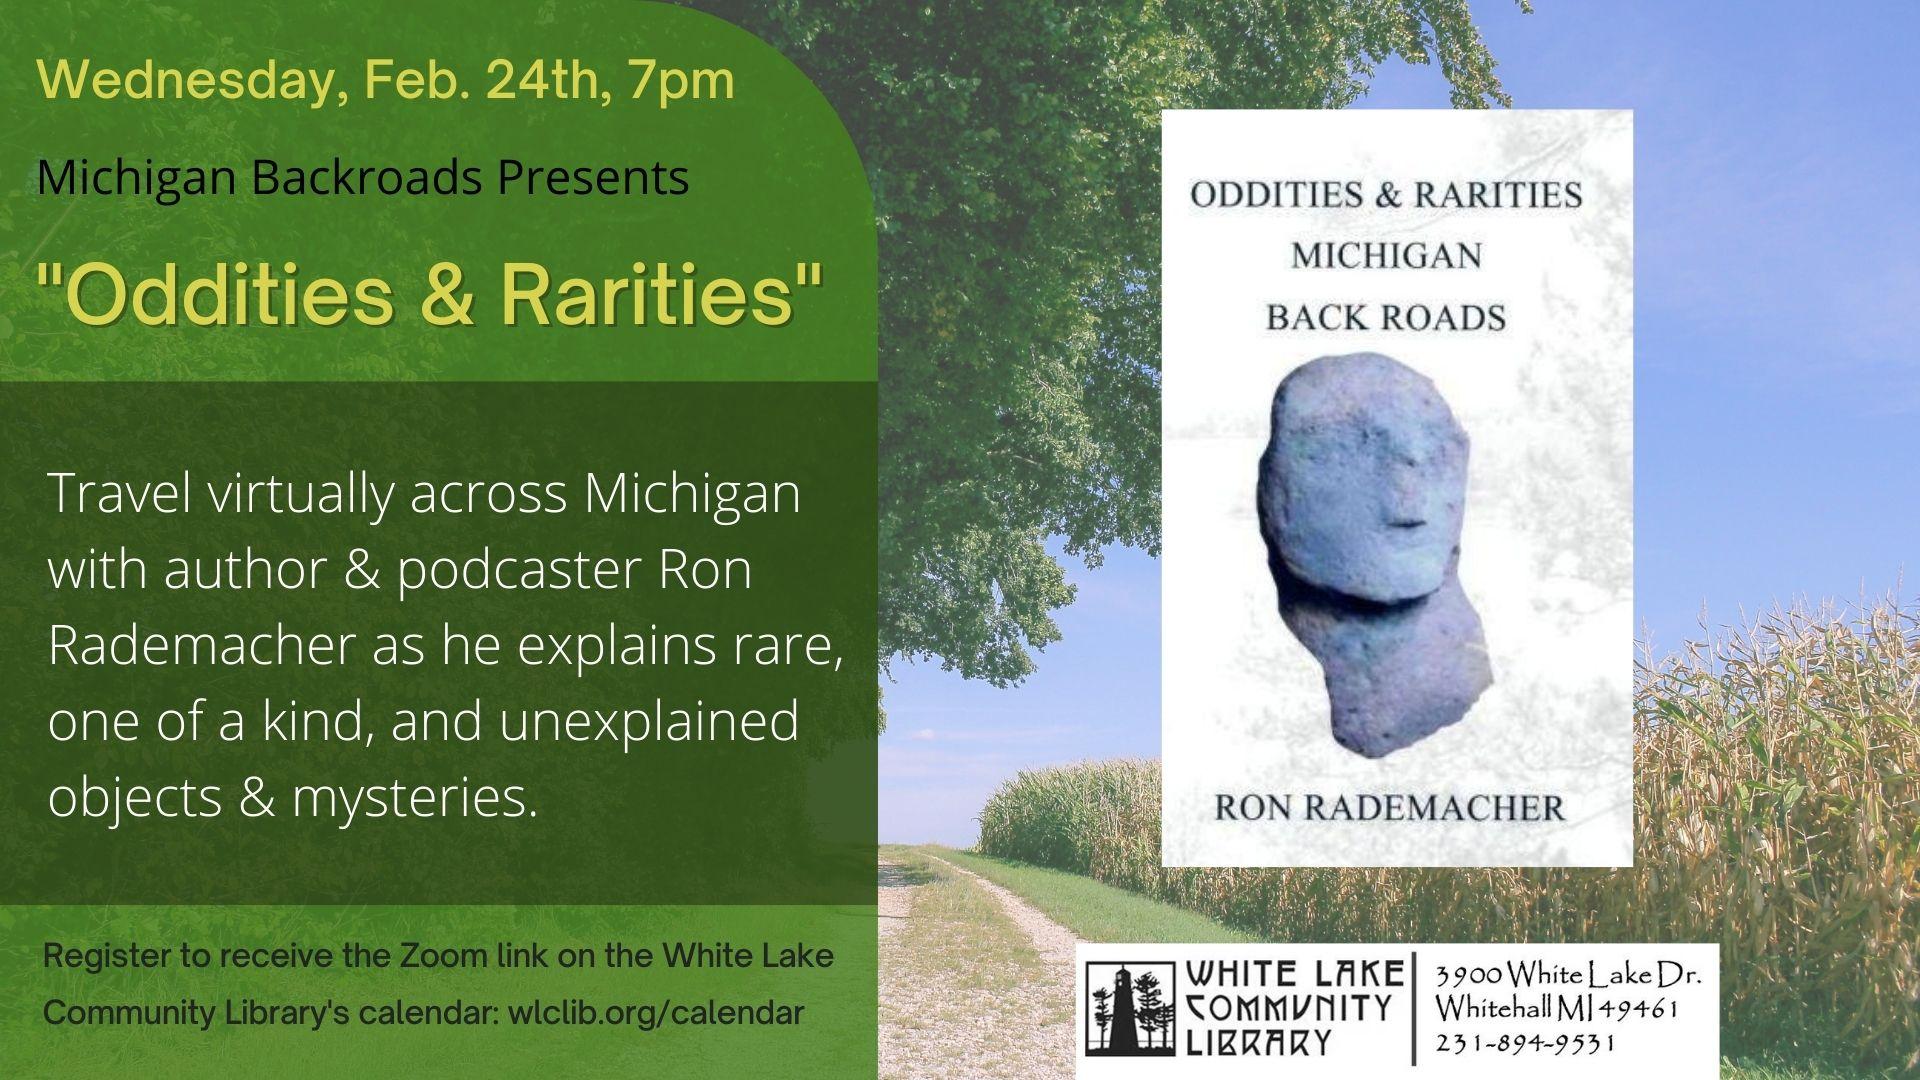 Michigan Backroads - Oddities and Rarities